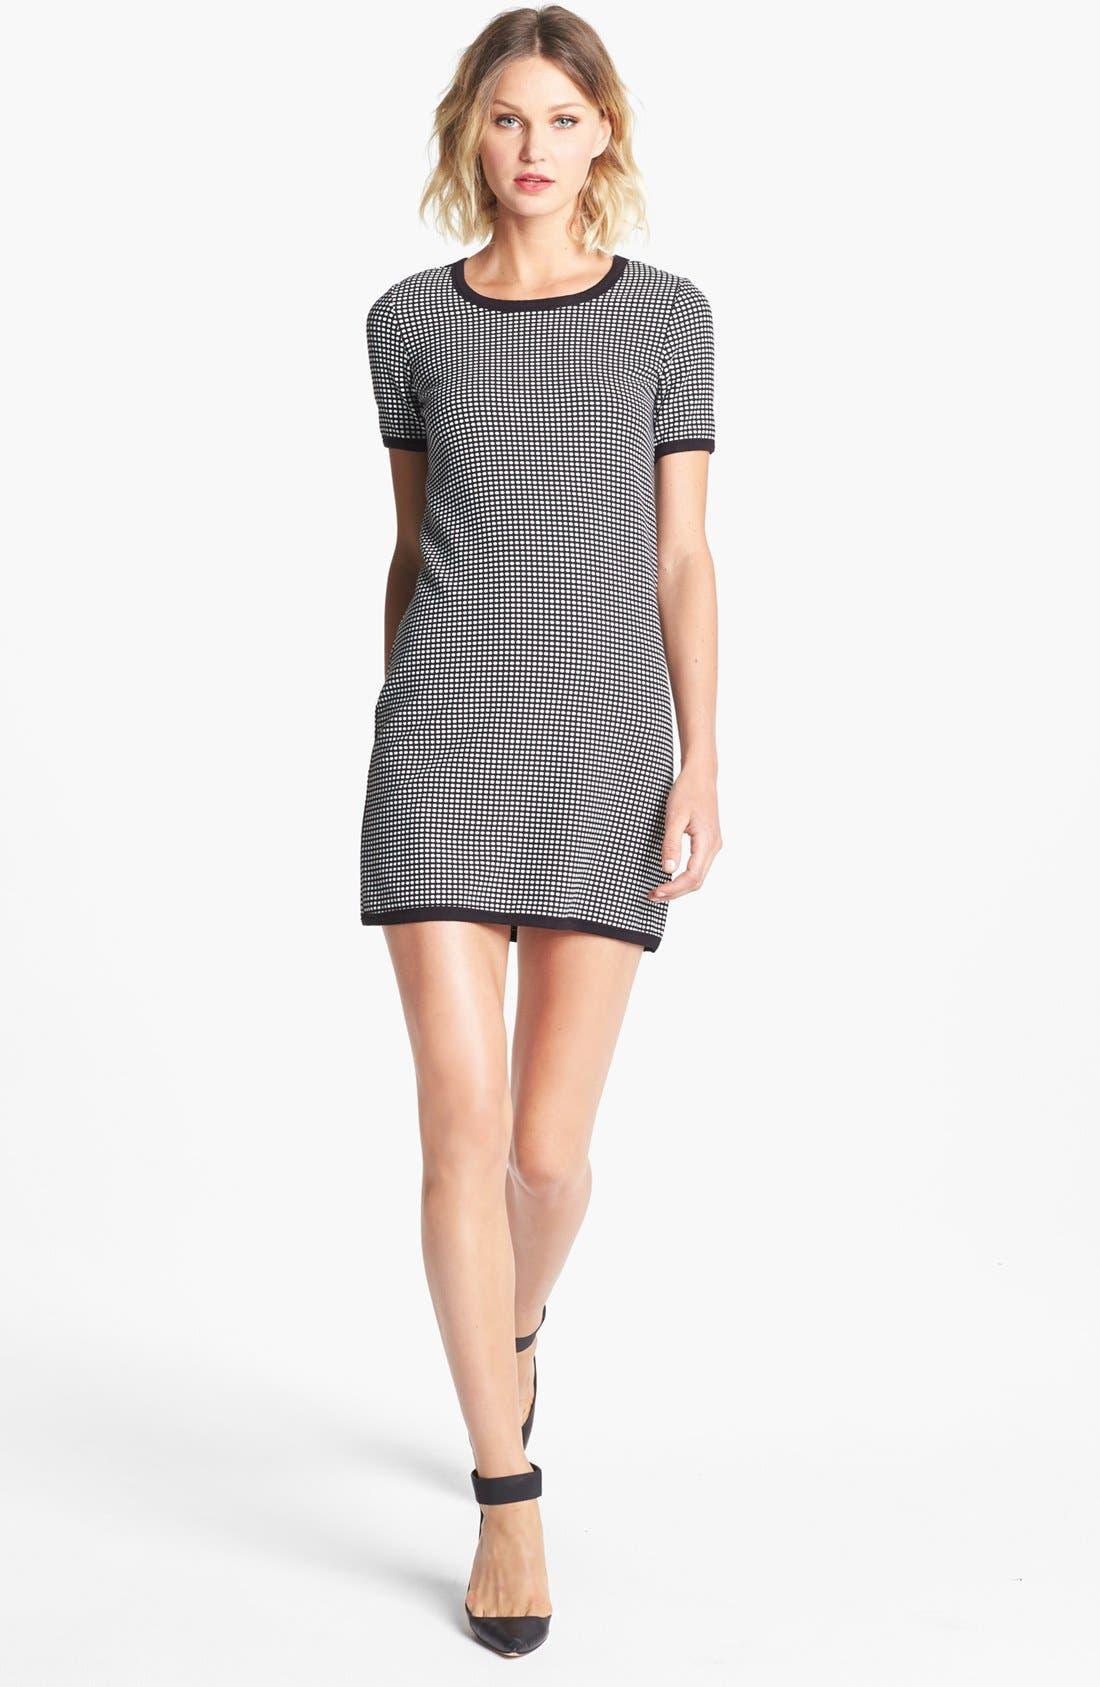 Main Image - Bailey 44 'Data Mining' Short Sleeve Dress